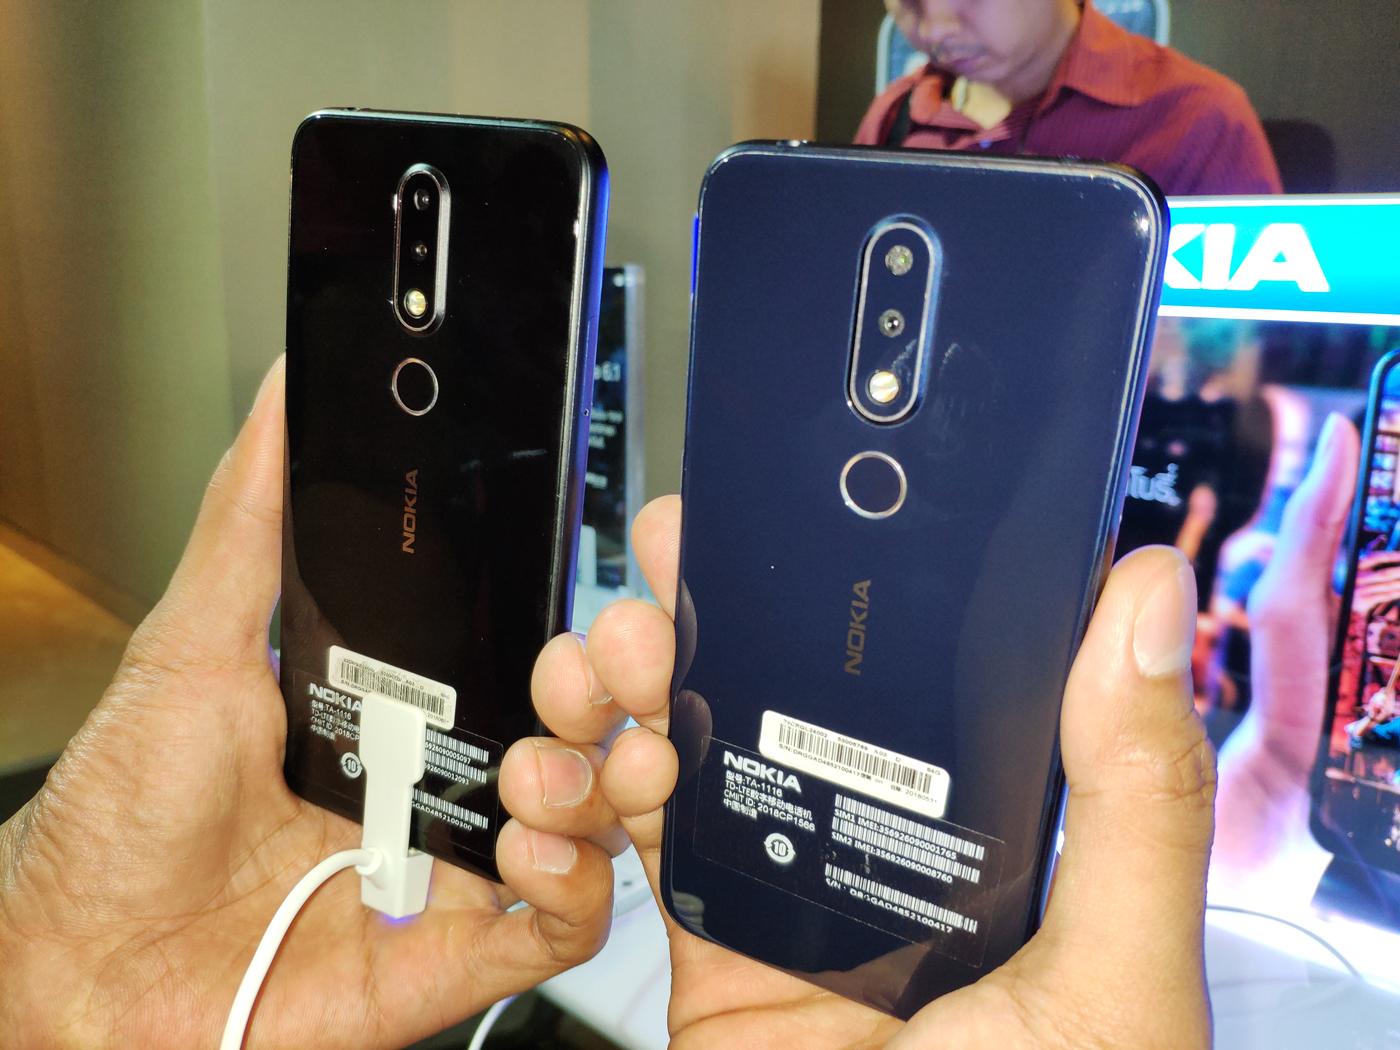 [Hands On] ลองจับ Nokia 6.1 Plus ดีไซน์หรูหรา จอ Fullview สเปคแจ่ม ในราคา 8,990 !!